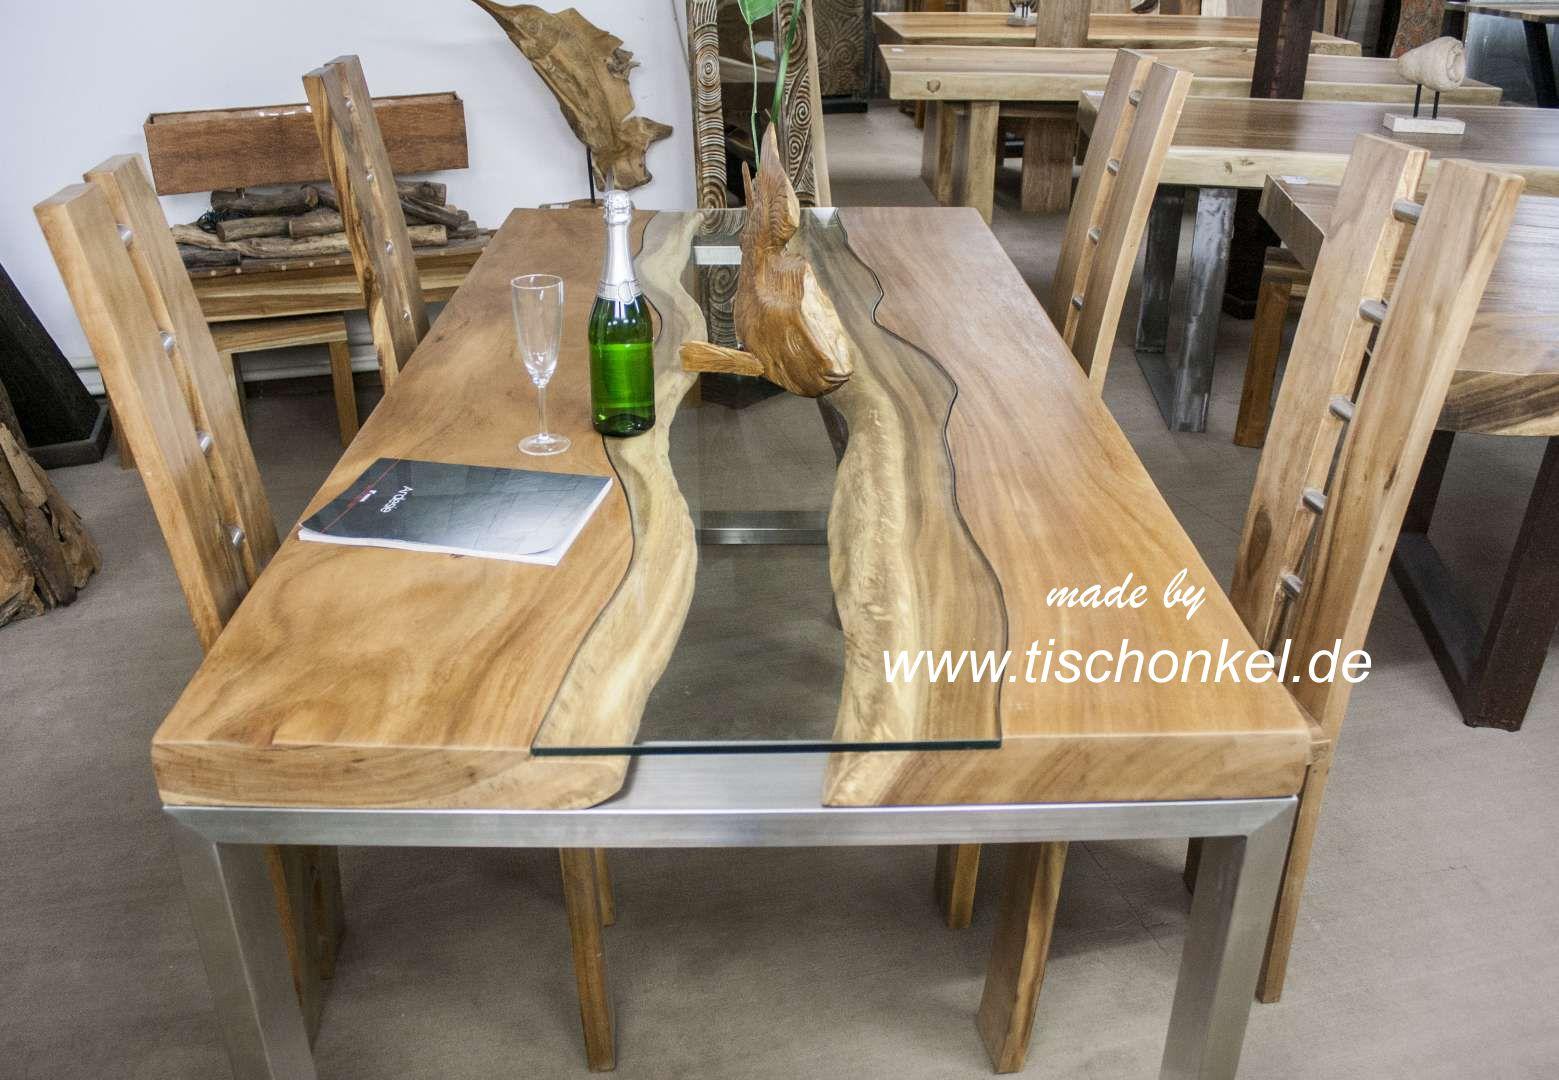 esstisch 200 x 100 cm serie elements der tischonkel. Black Bedroom Furniture Sets. Home Design Ideas